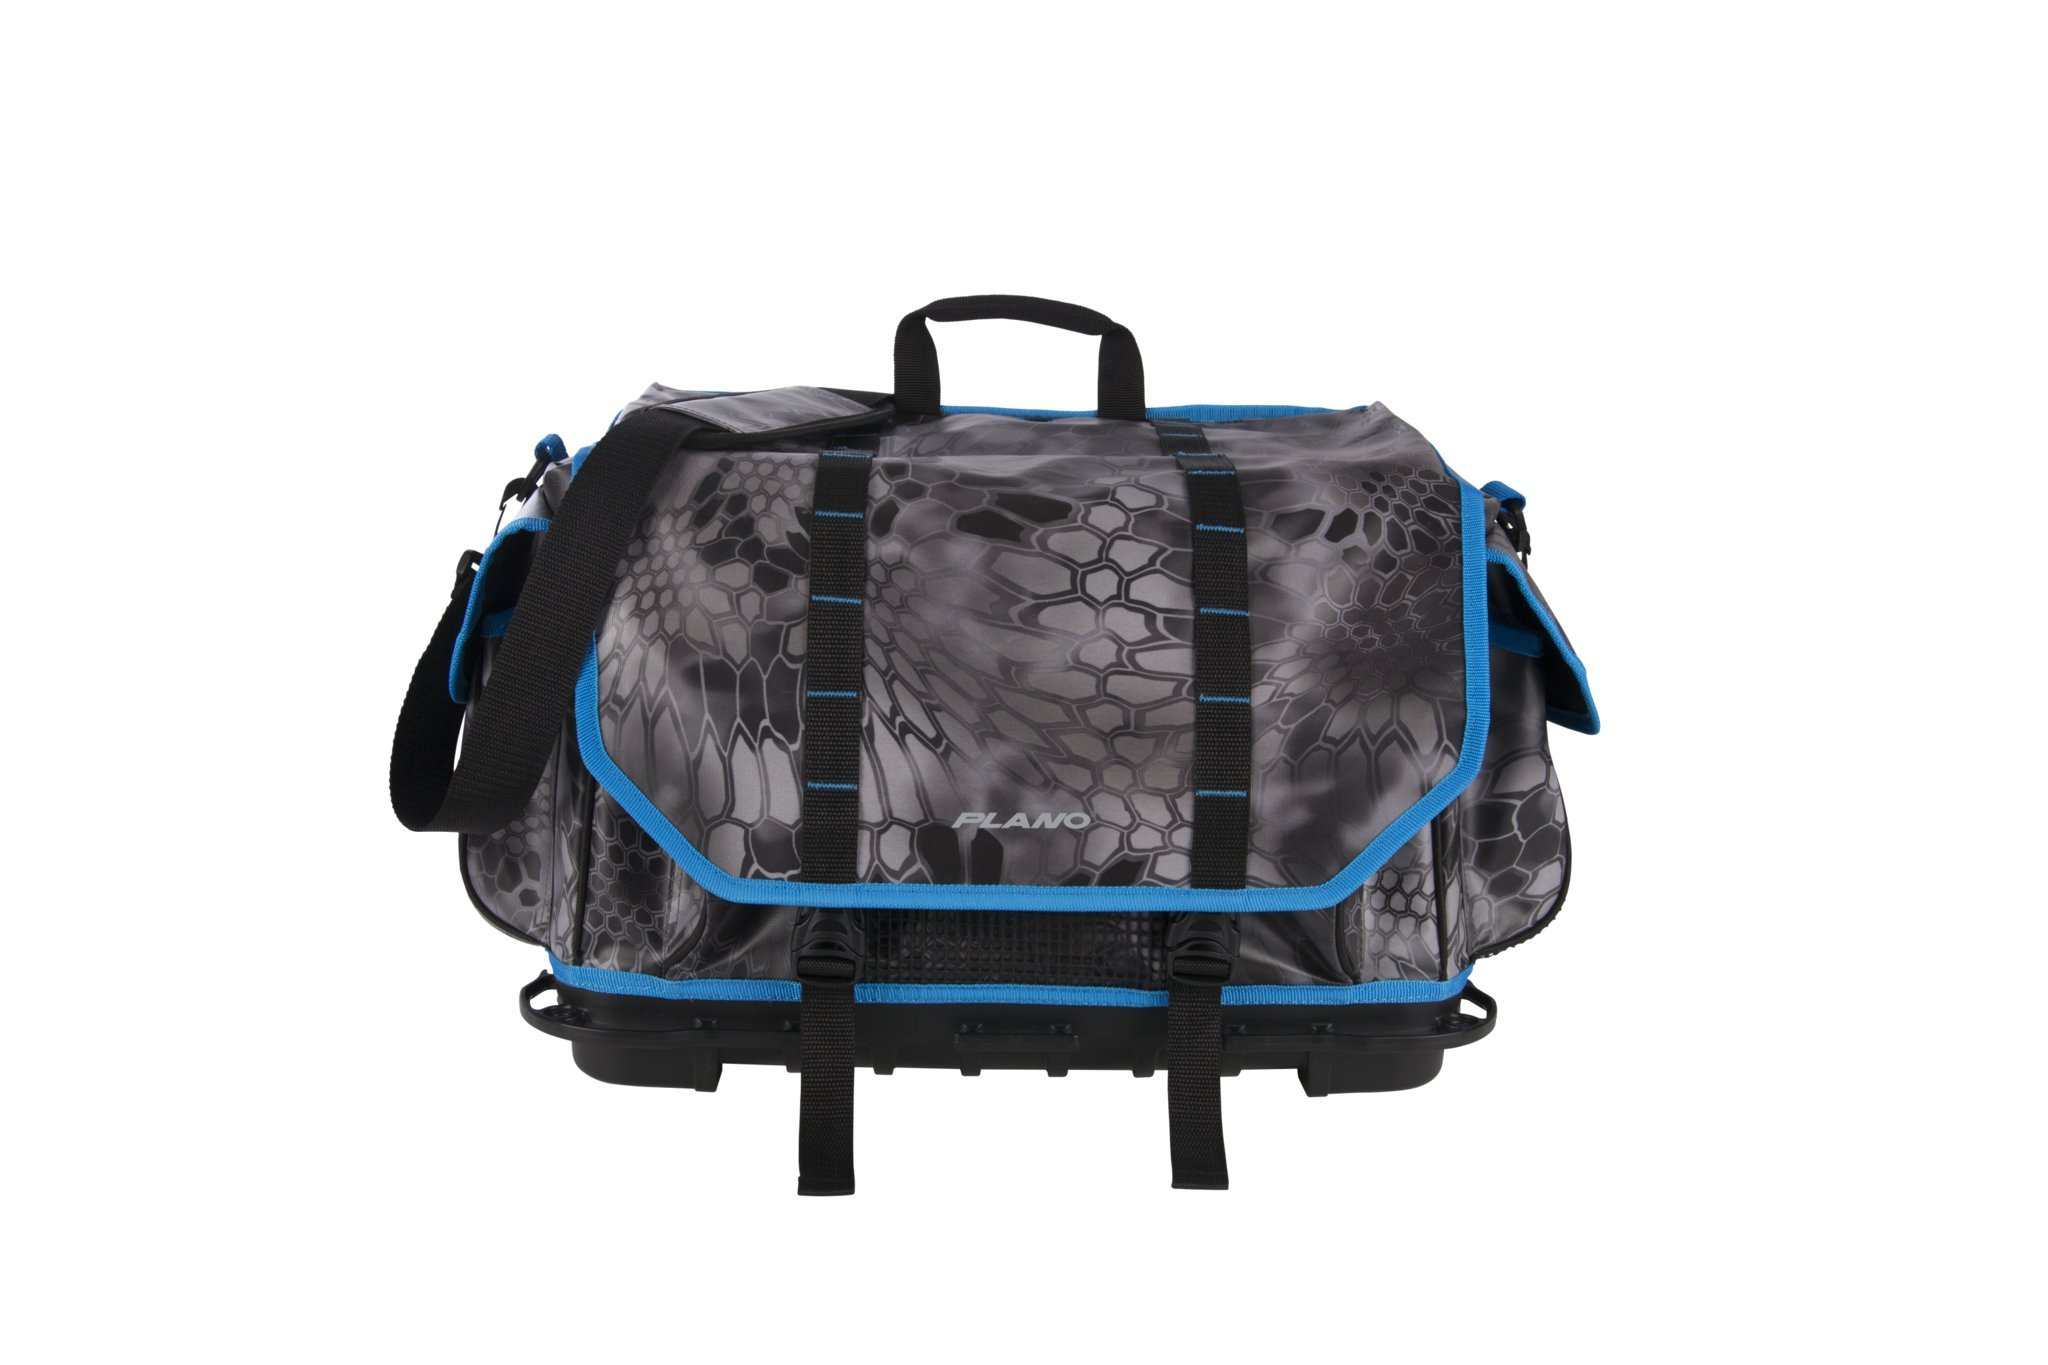 Plano PLAB37800 Z- Series 3700 Size Tackle Bag, Kryptek Raid/Blue